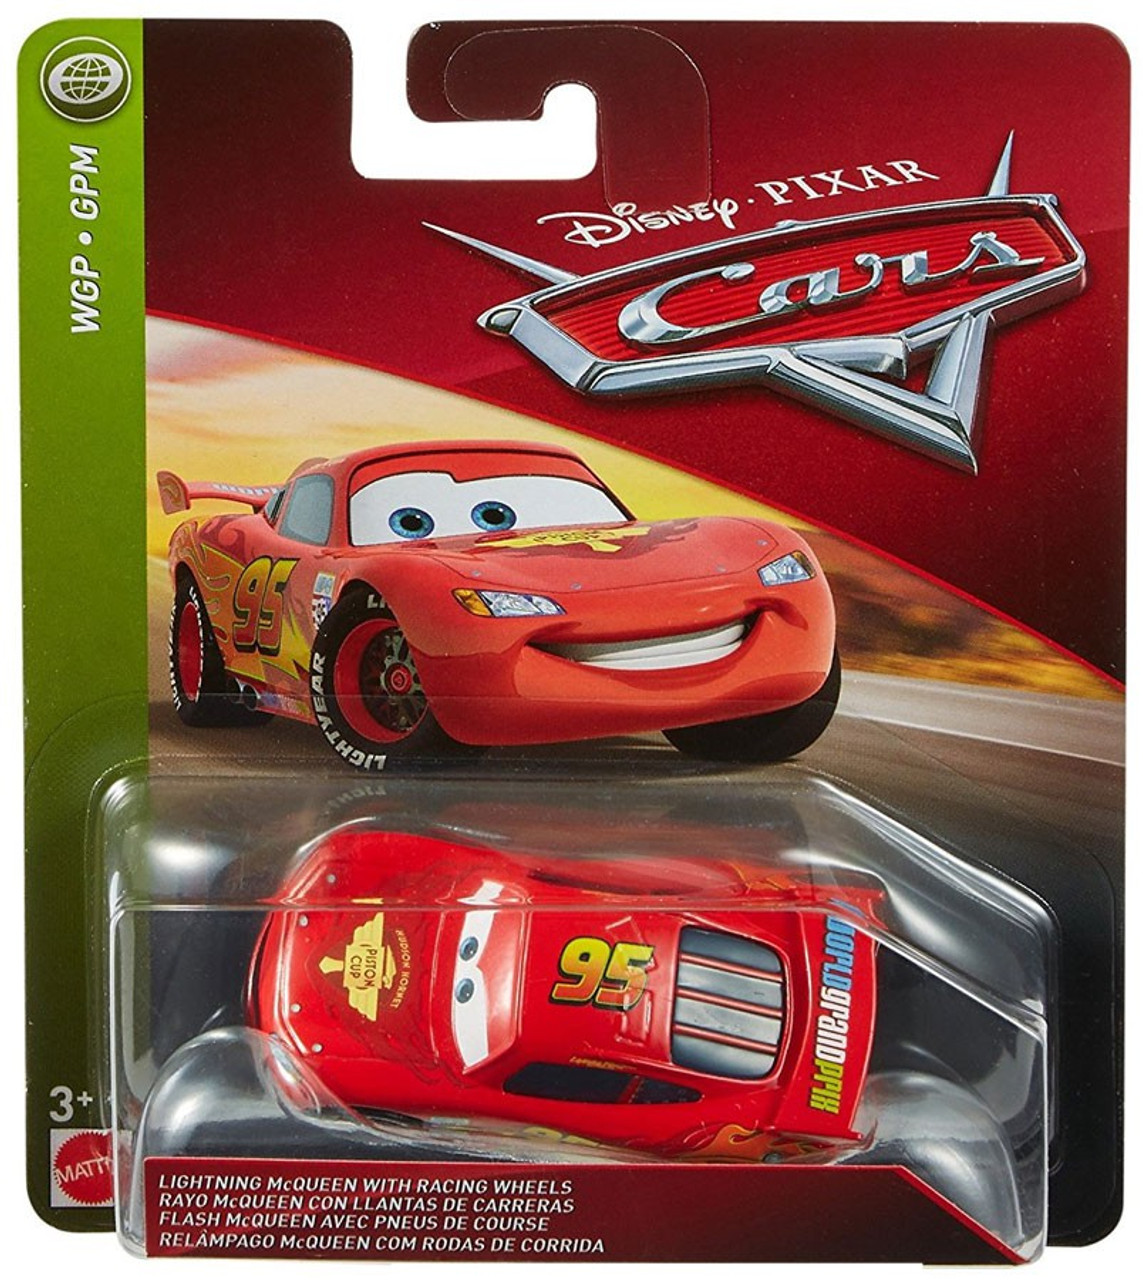 Disney Pixar Cars Cars 3 Wgp Lightning Mcqueen With Racing Wheels Diecast Car